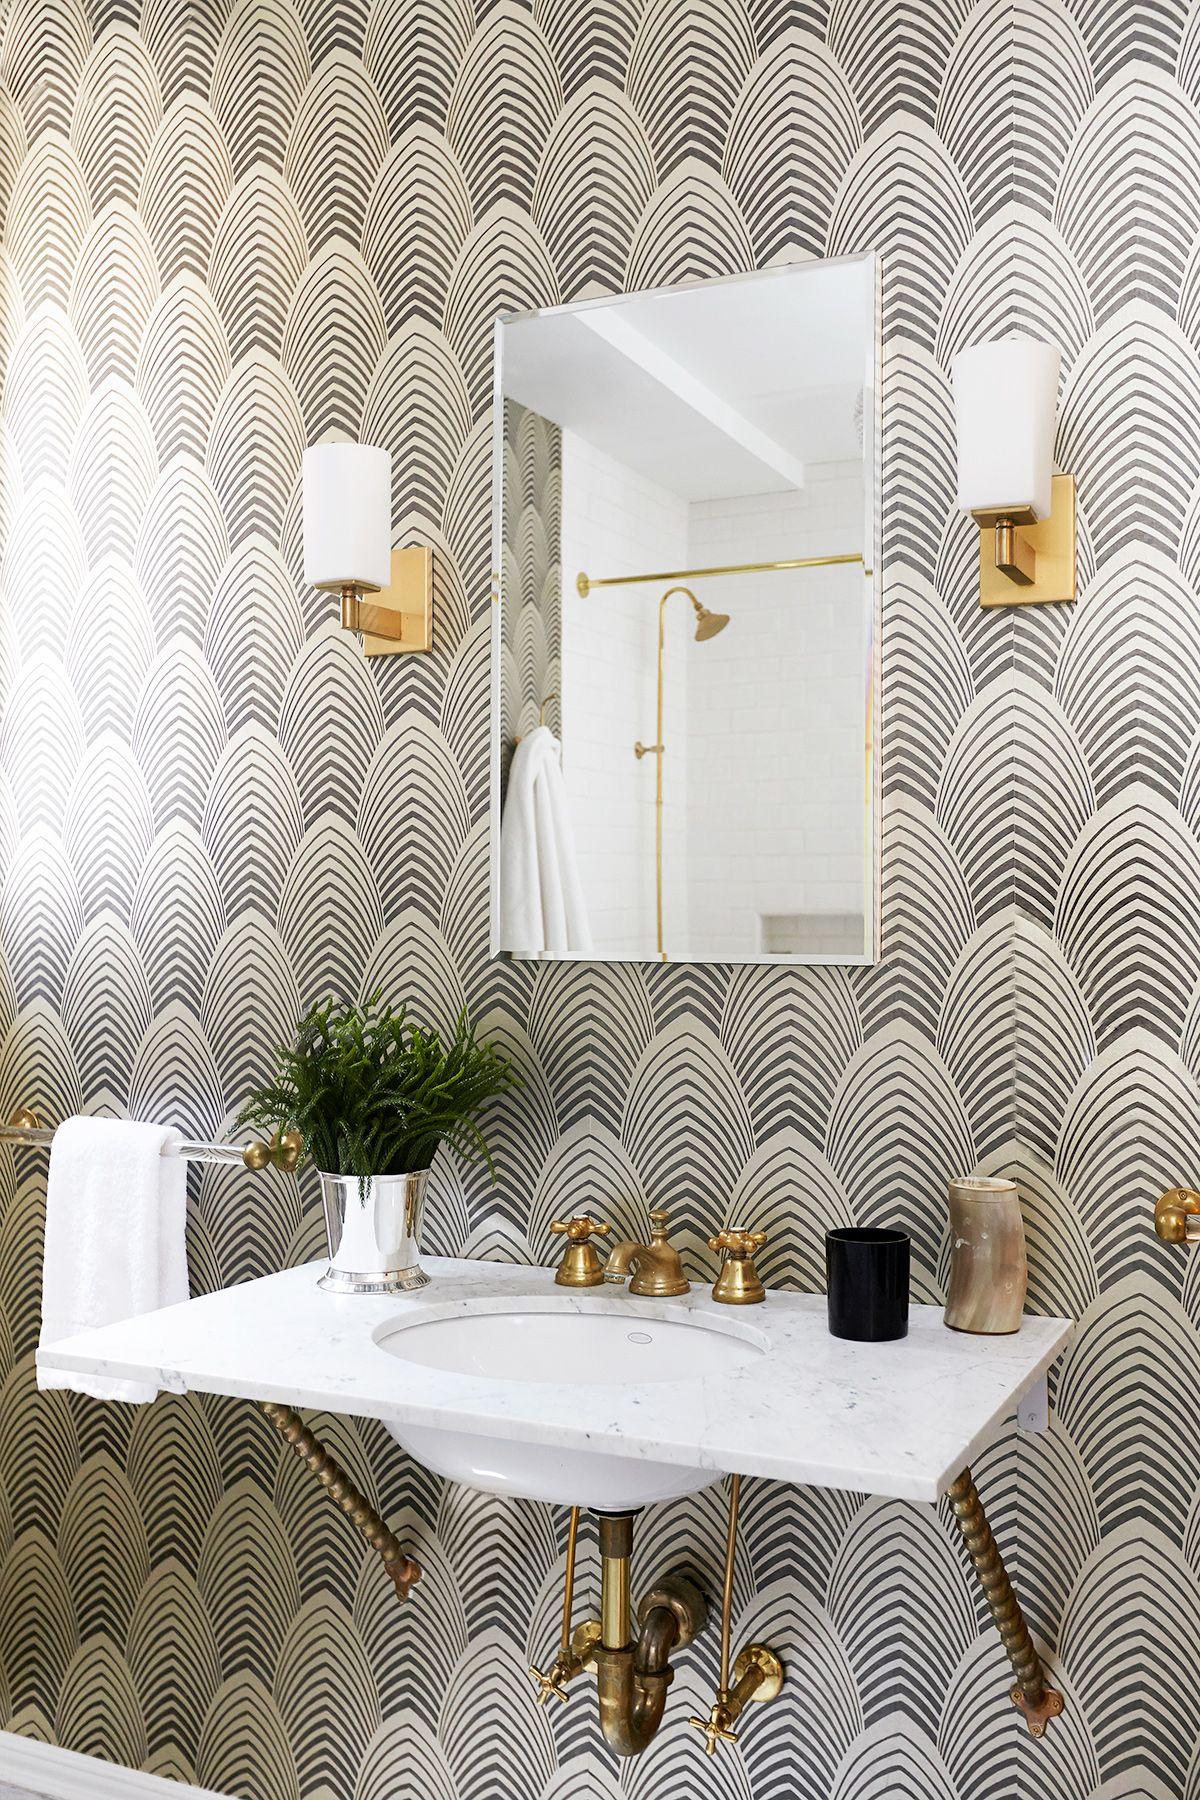 Bathroom Ideas - Home Renovation - Interior Design | Townhouse ...